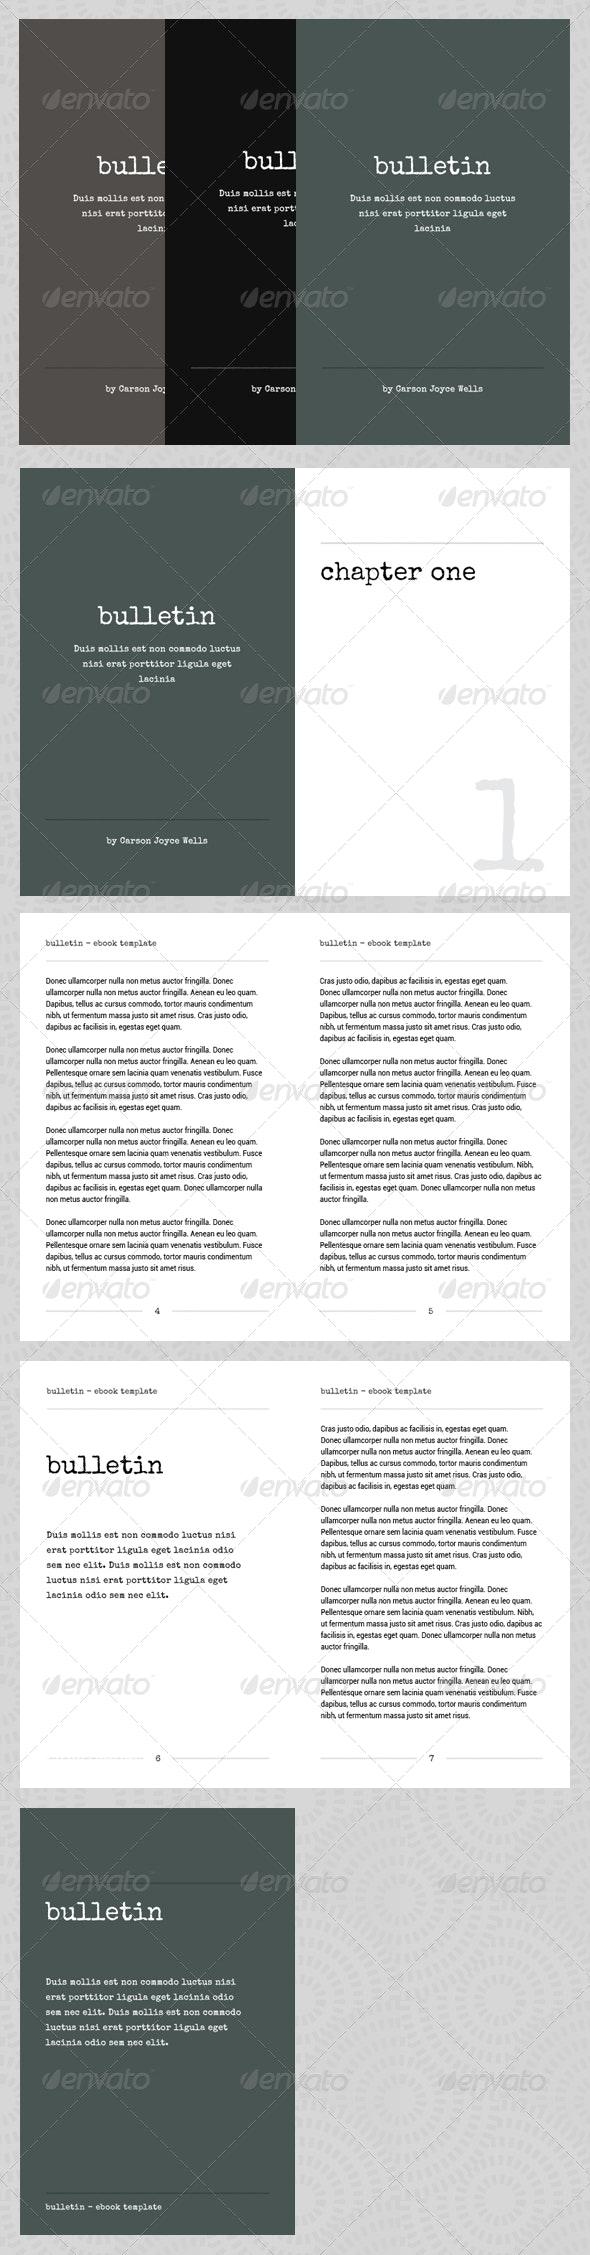 Bulletin - eBook Template or Print Book - Miscellaneous Print Templates